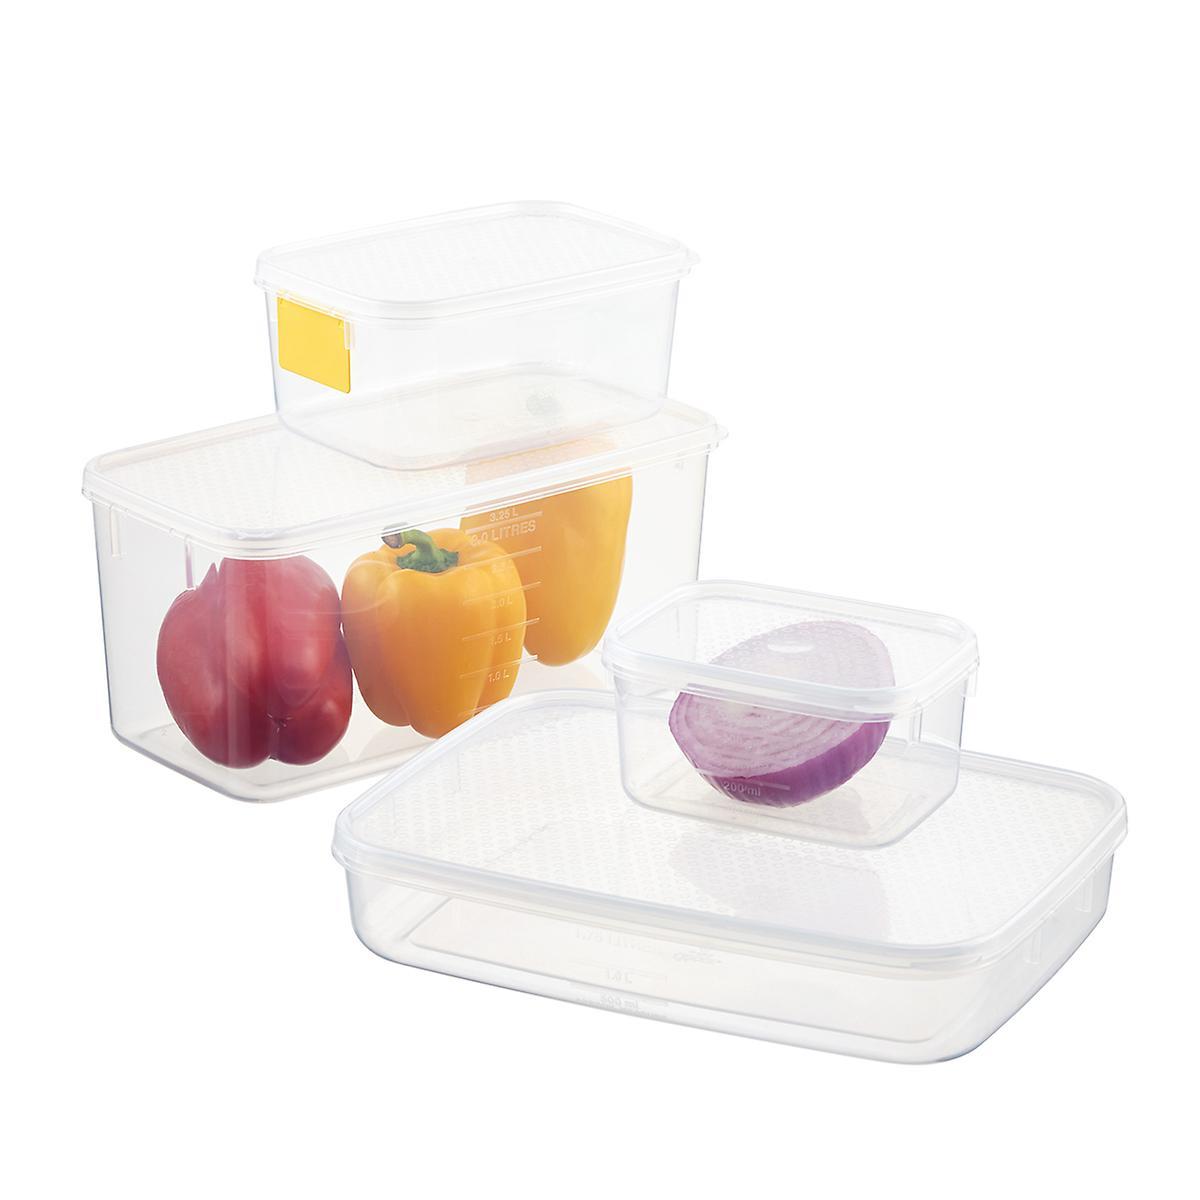 Tellfresh Oblong Food Storage